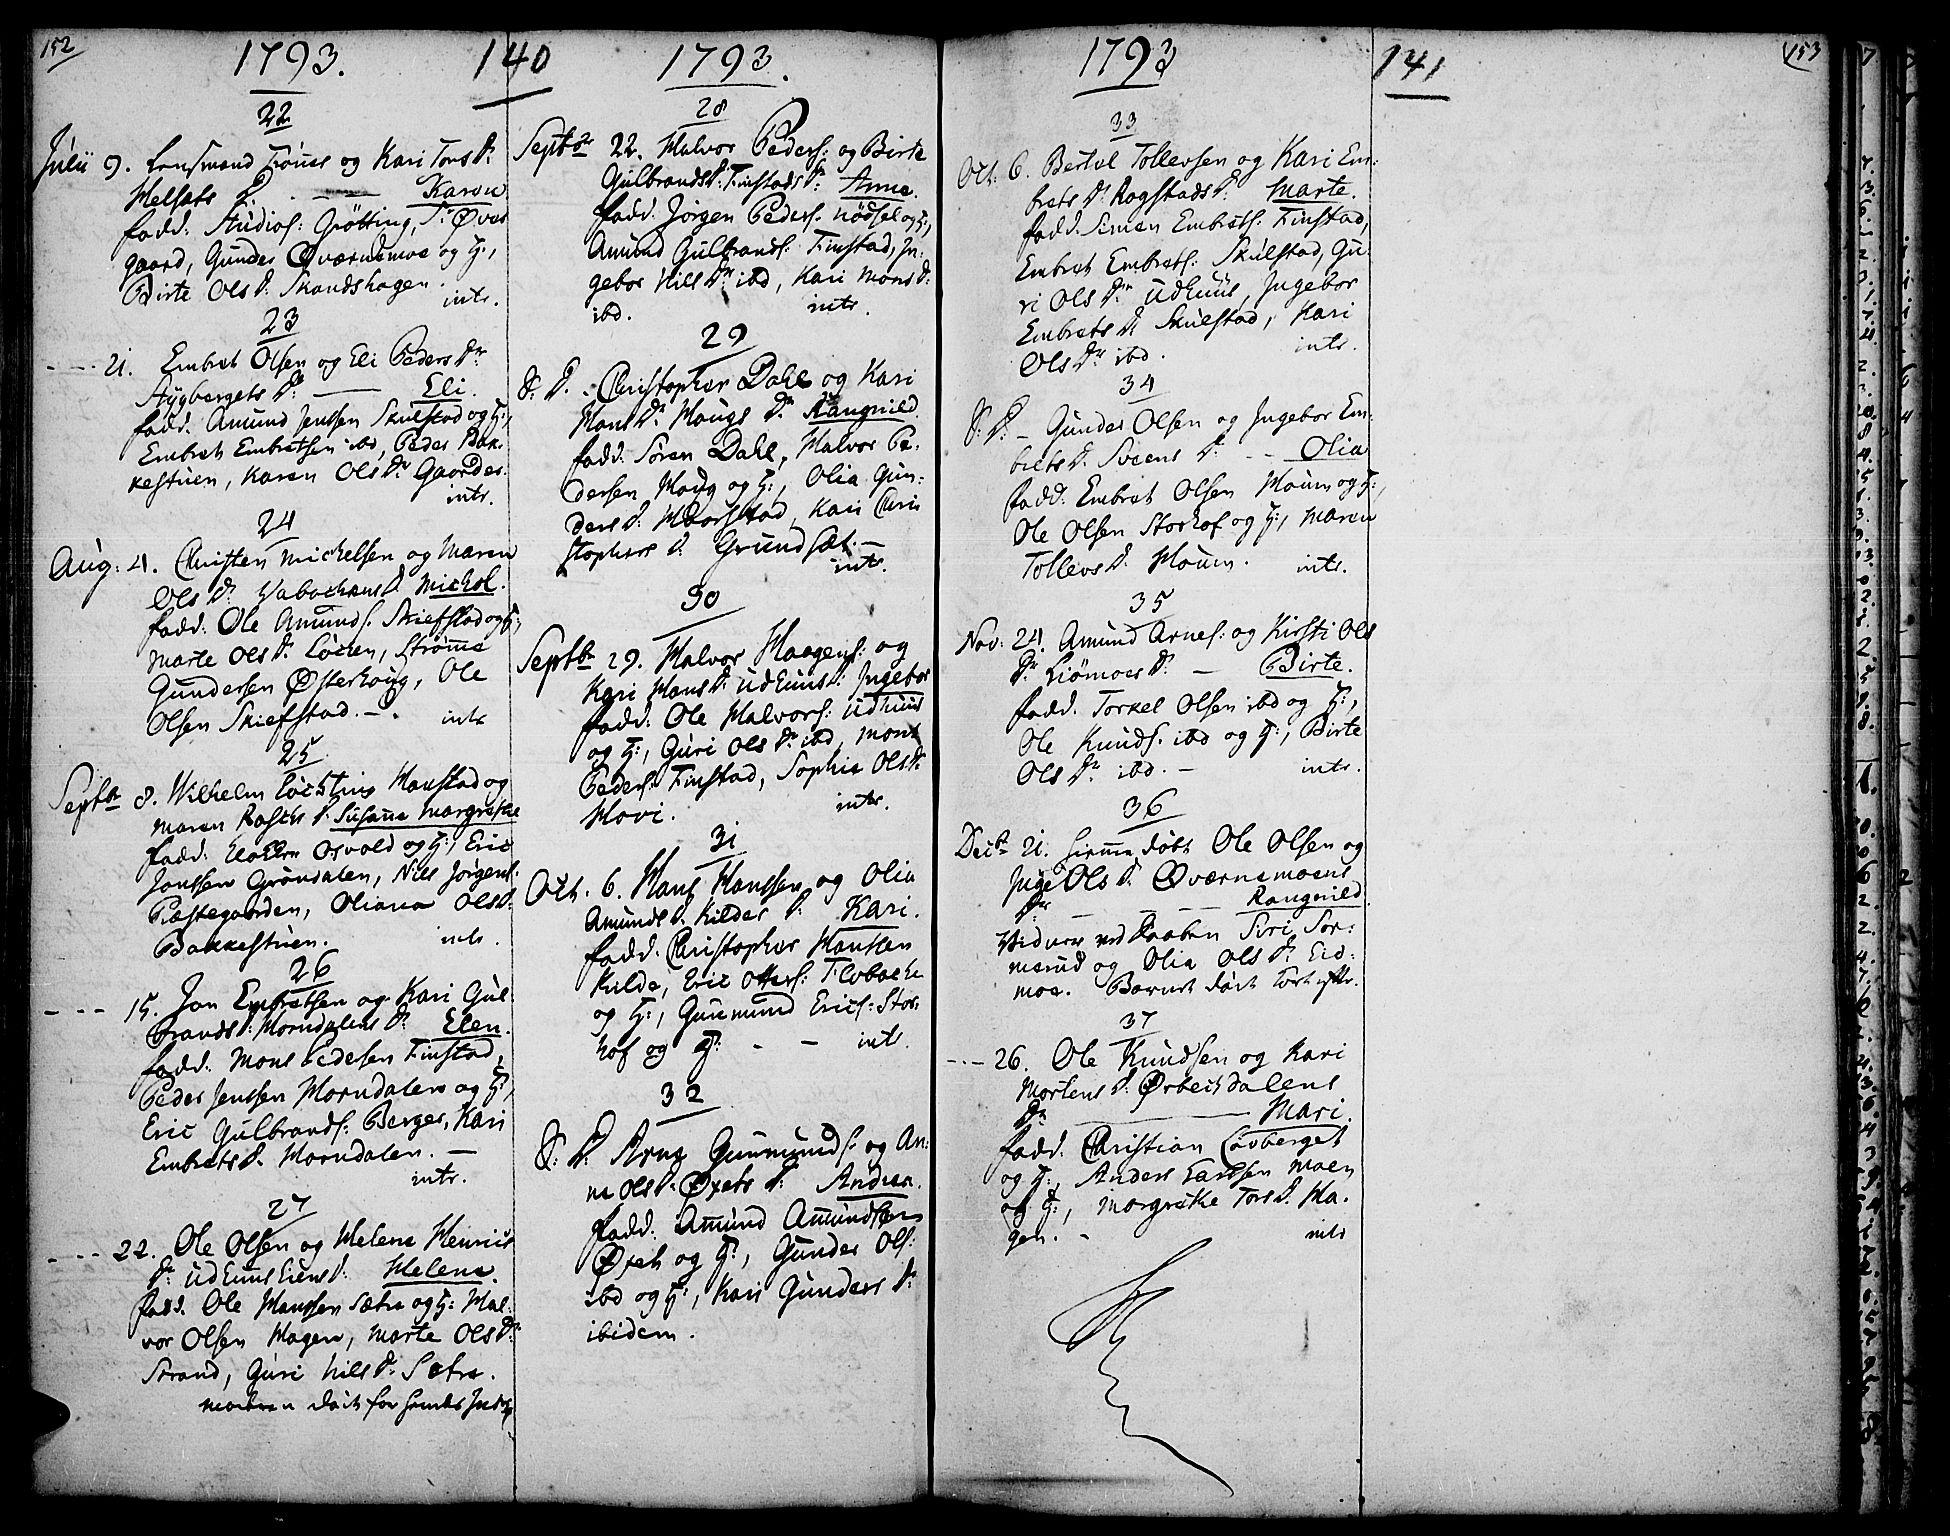 SAH, Elverum prestekontor, H/Ha/Haa/L0005: Ministerialbok nr. 5, 1777-1793, s. 140-141